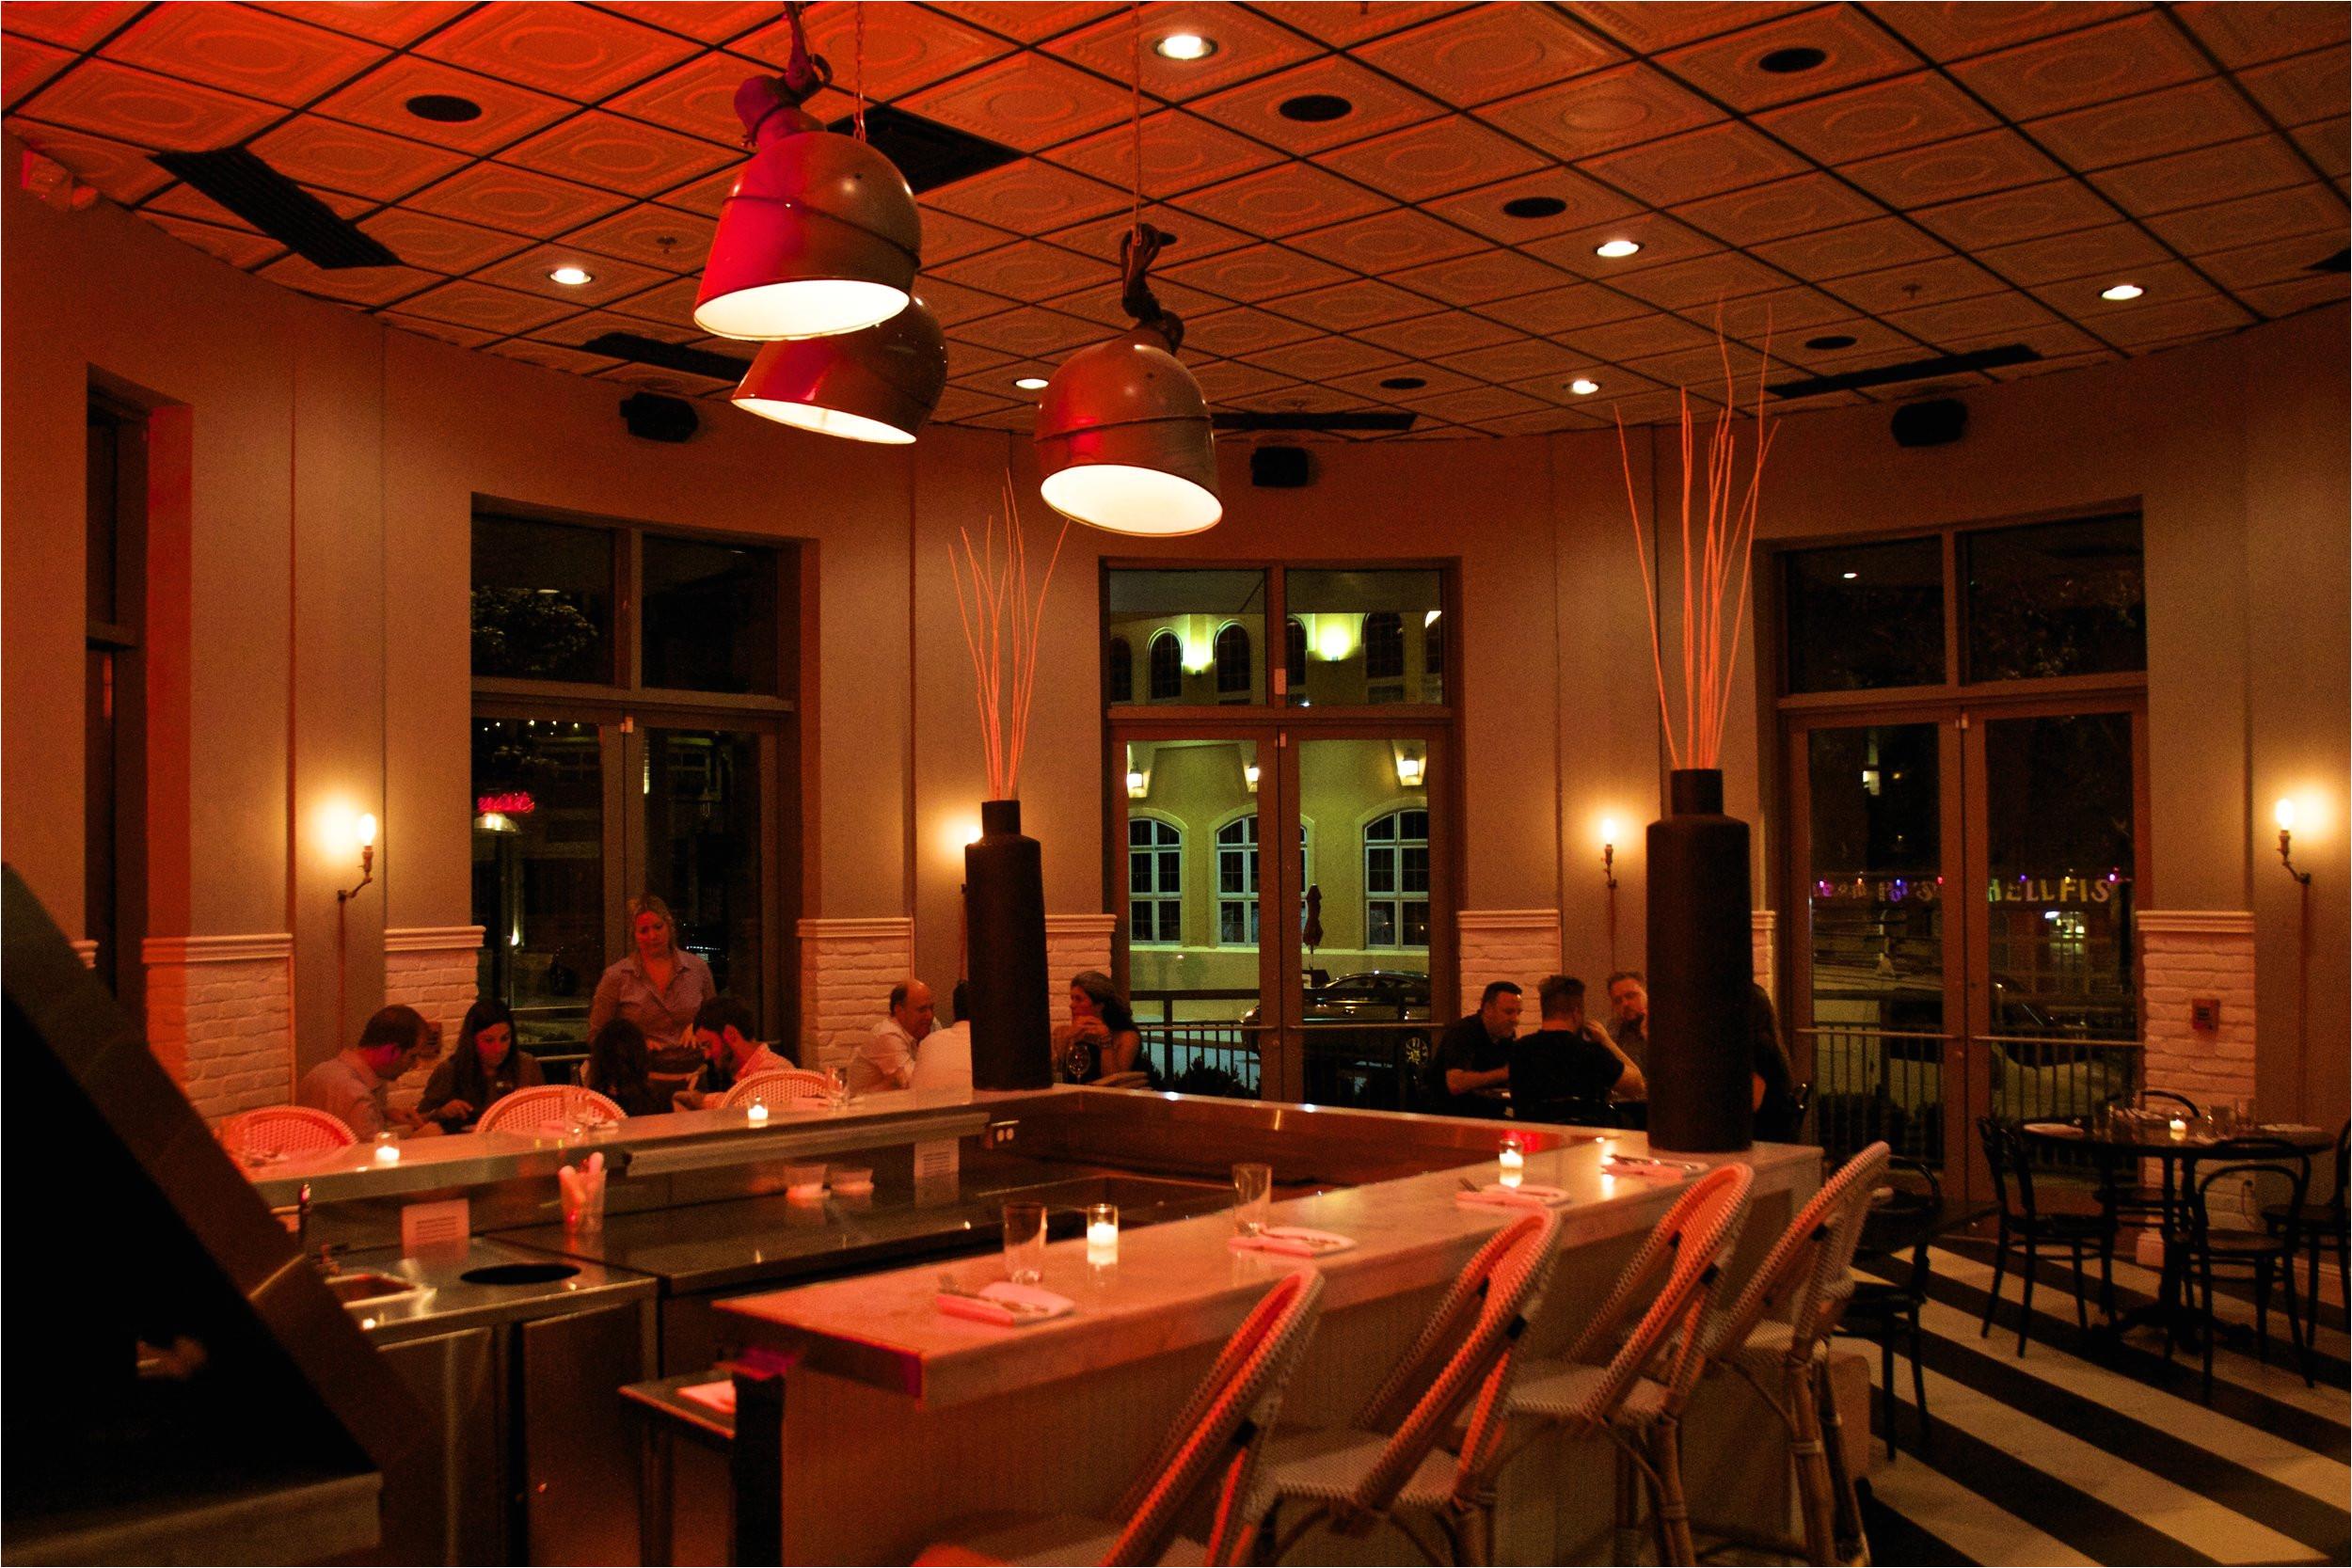 Opentable Virago Nashville Tn Best Restaurants In Nashville Tennesse Peter S Big Adventure